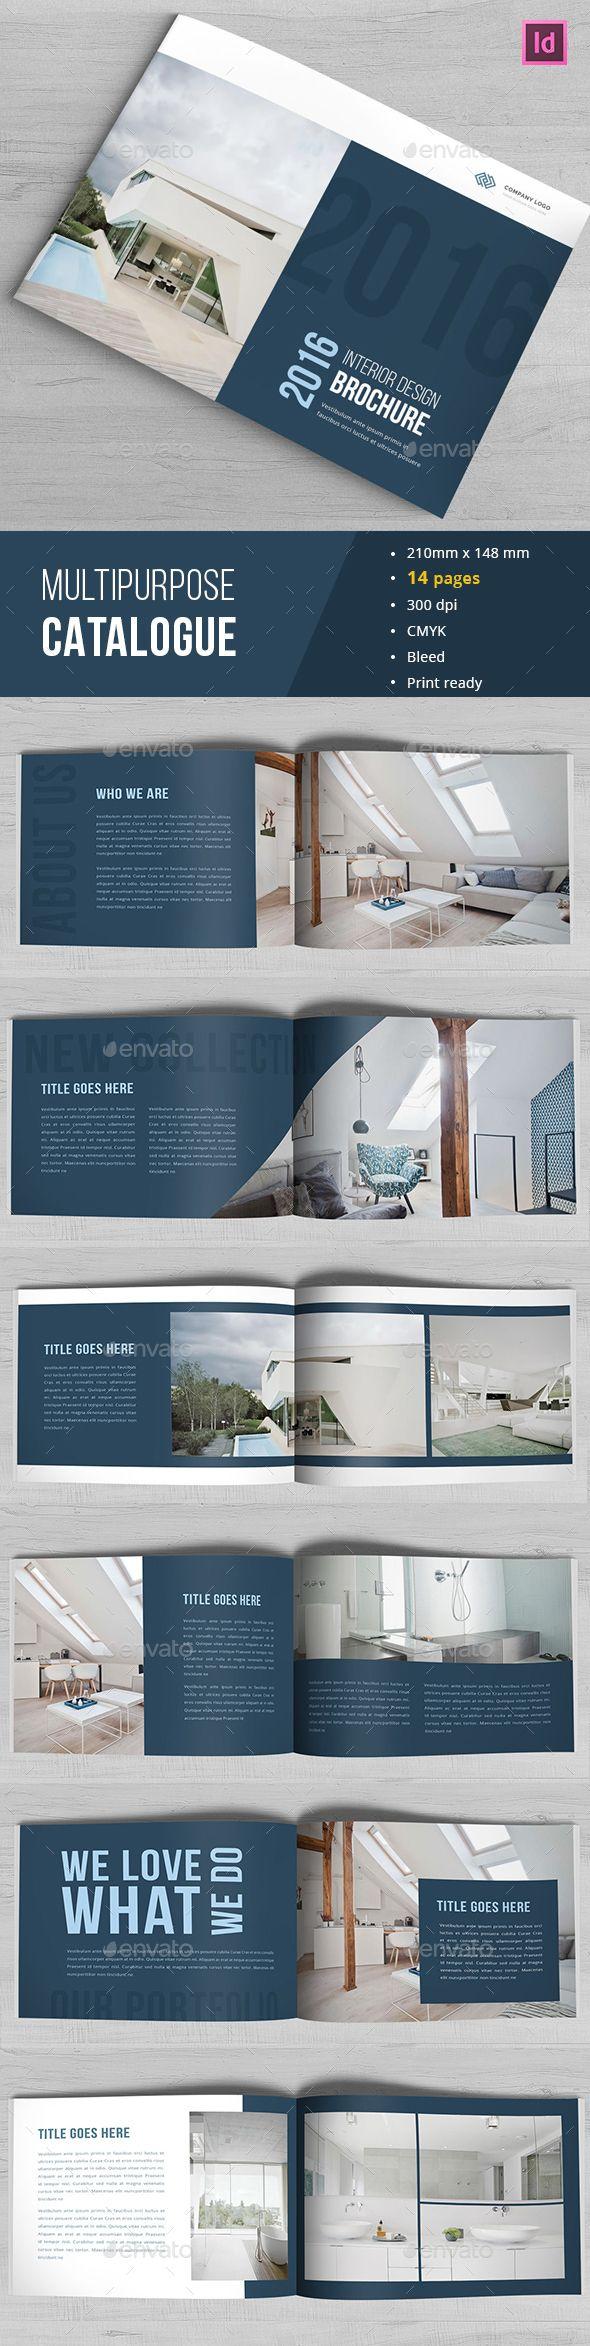 Indesign Portfolio Catalogue  Template • Download ➝ https://graphicriver.net/item/indesign-portfolio-catalogue/17033561?ref=pxcr